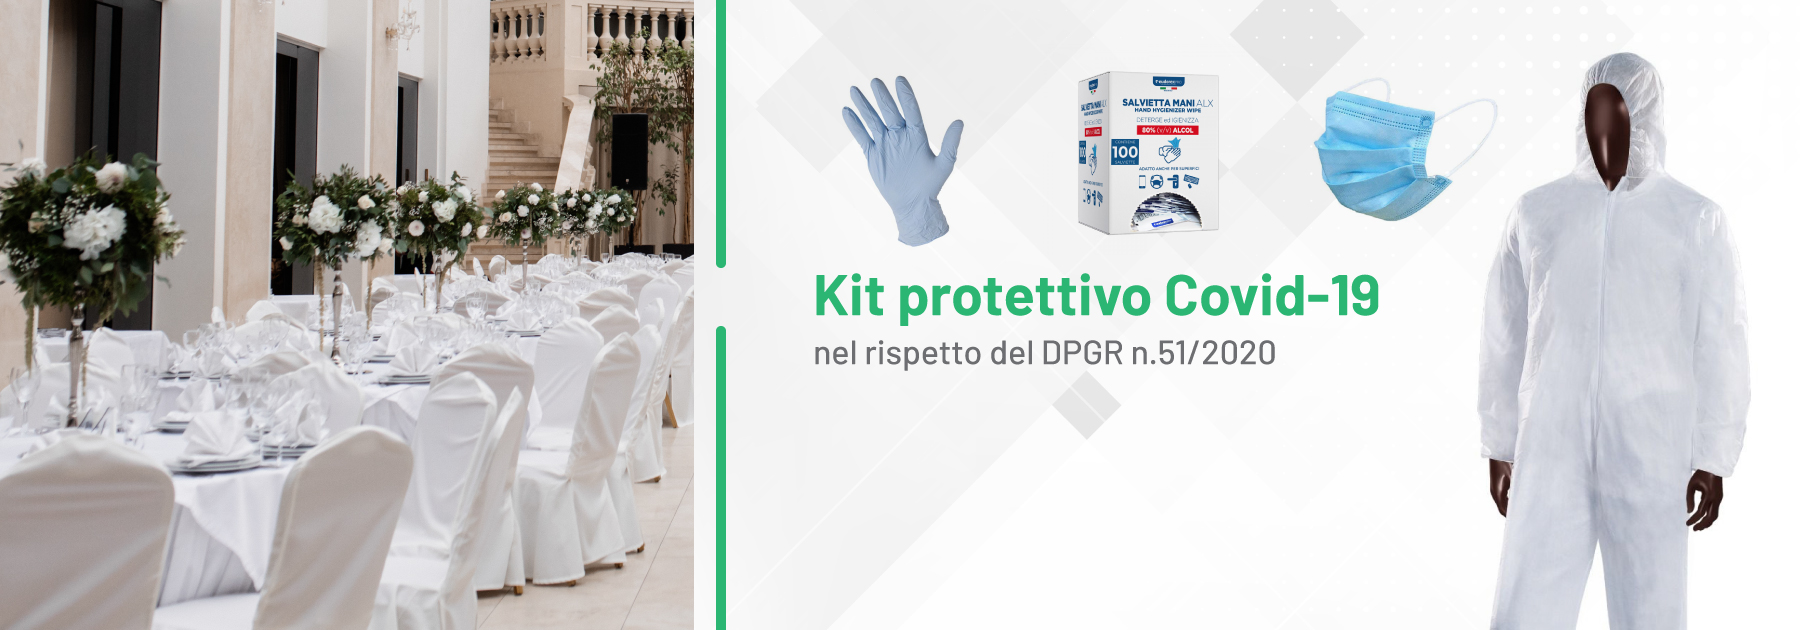 Kit protettivo DPGR 51/2020